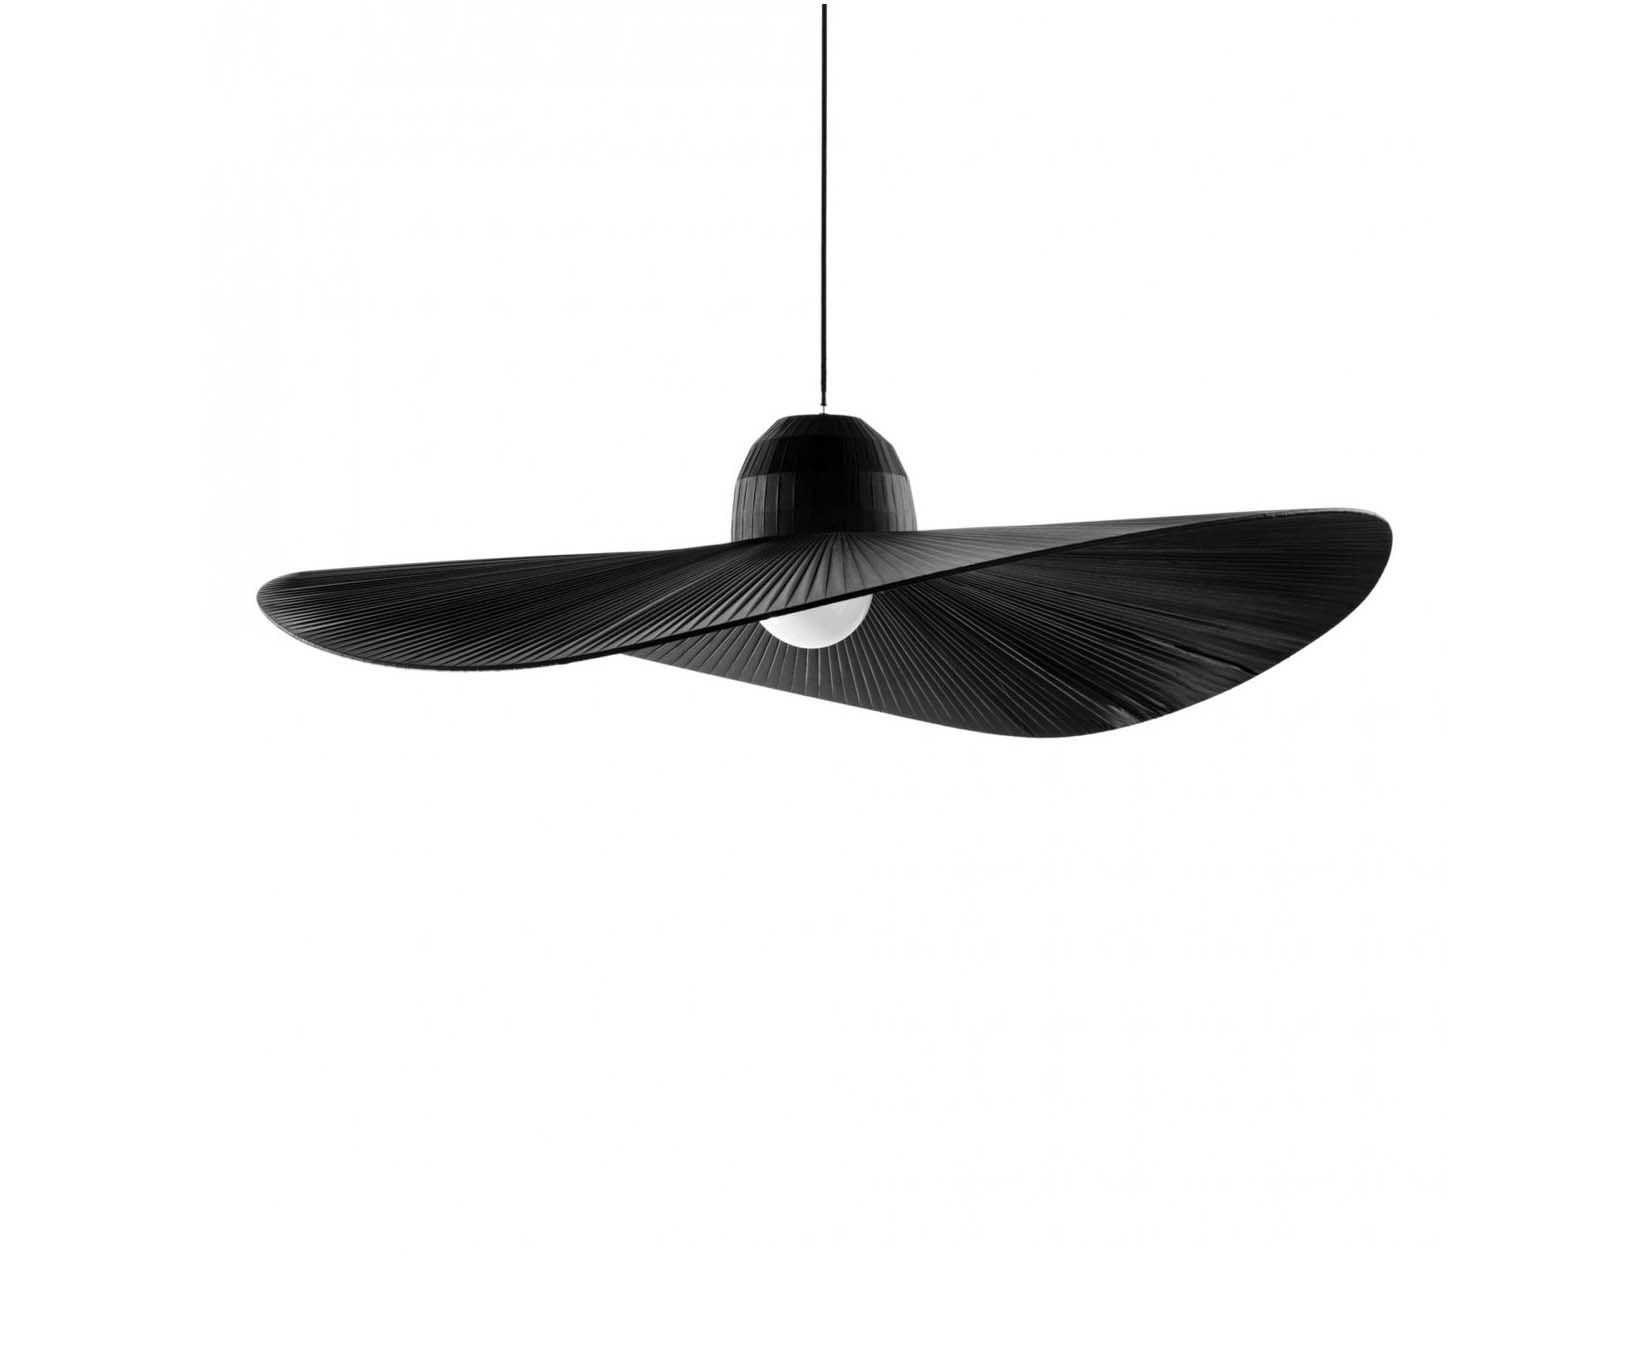 Lampadario Bianco Opaco : Lampadario moderno design luce madame sp nero lampadari